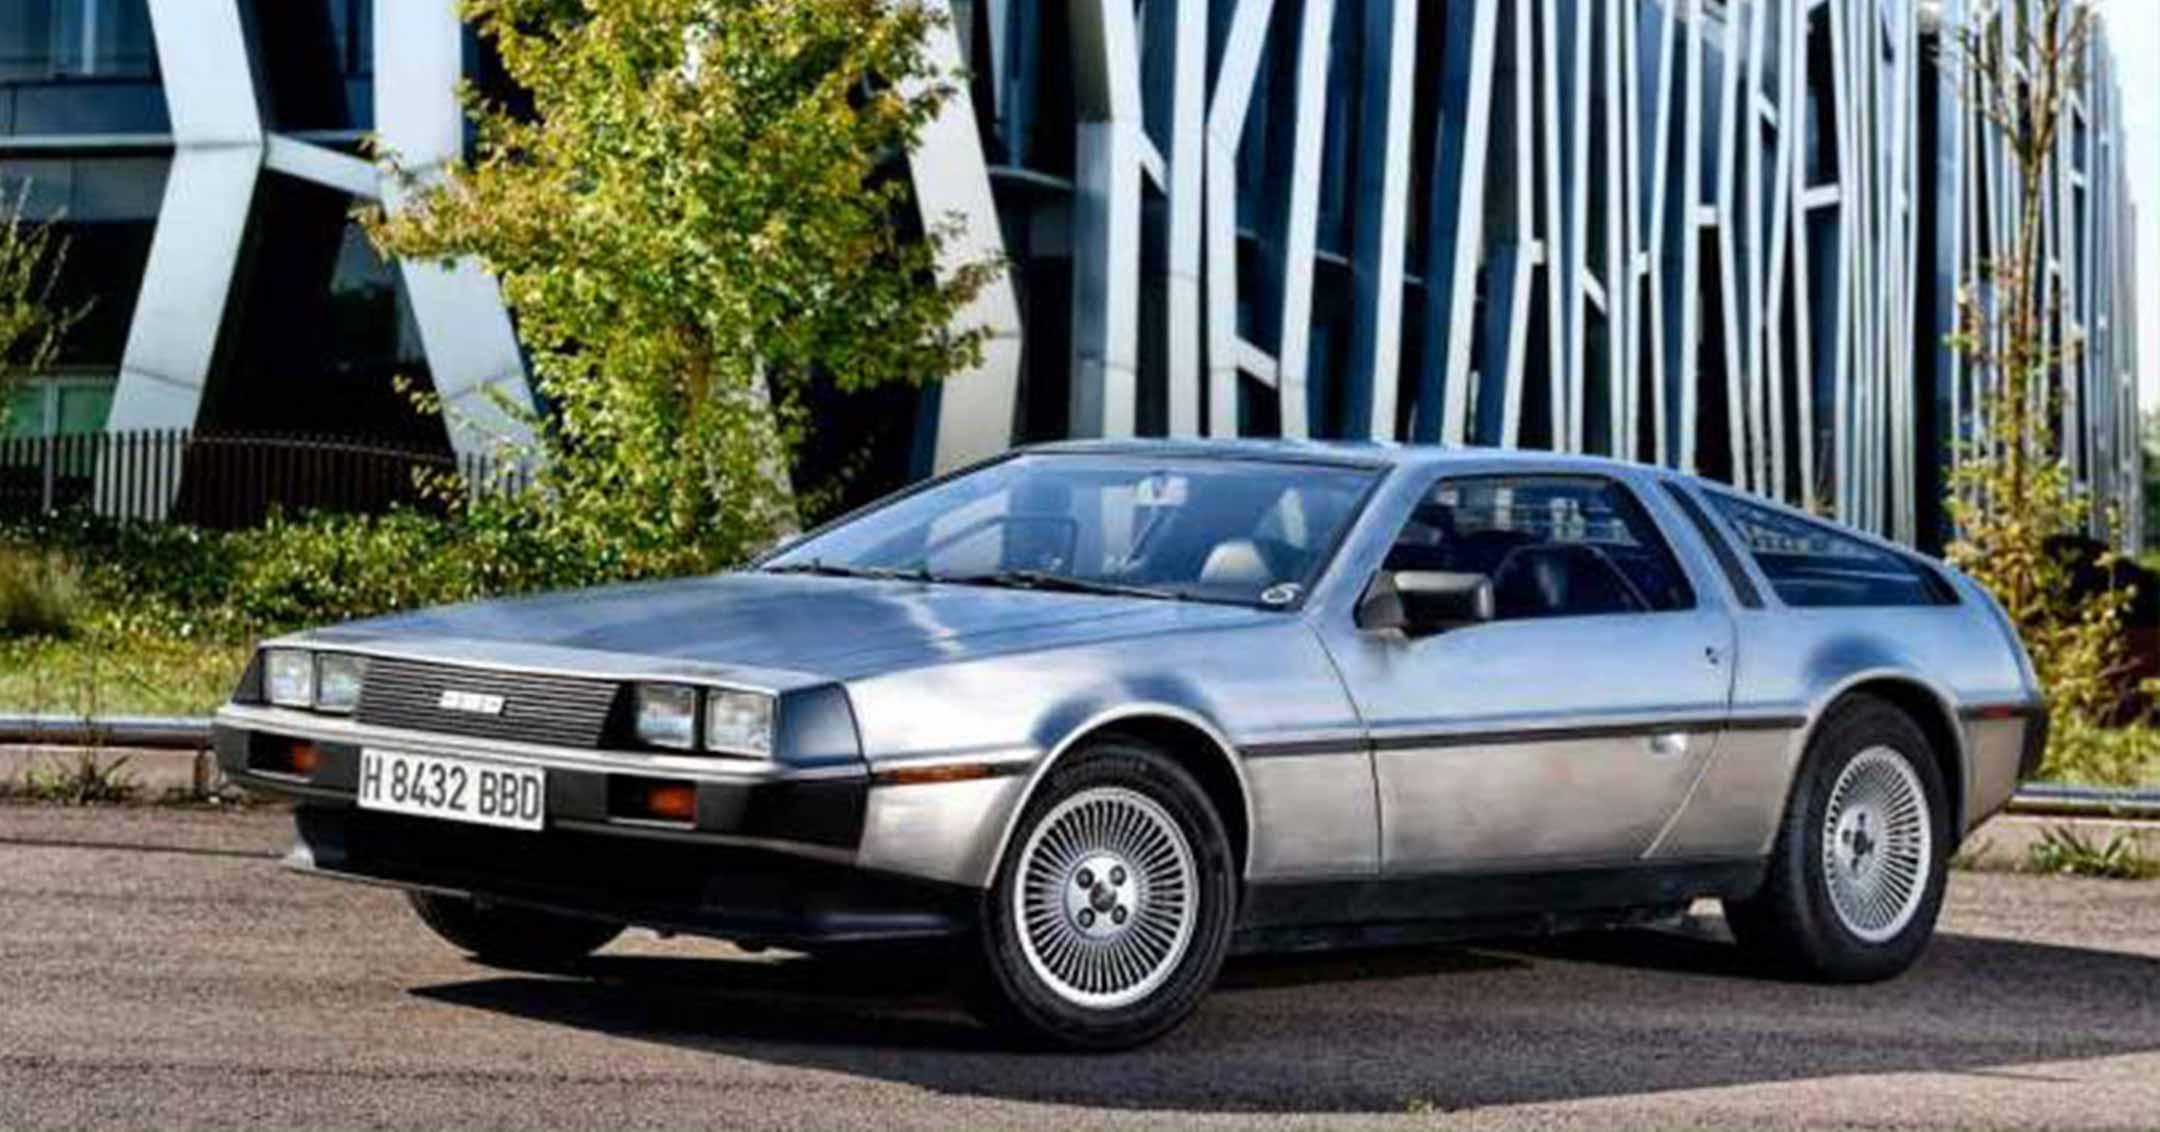 SCEDT26T8BD005860 | DeLoreanDirectory.com